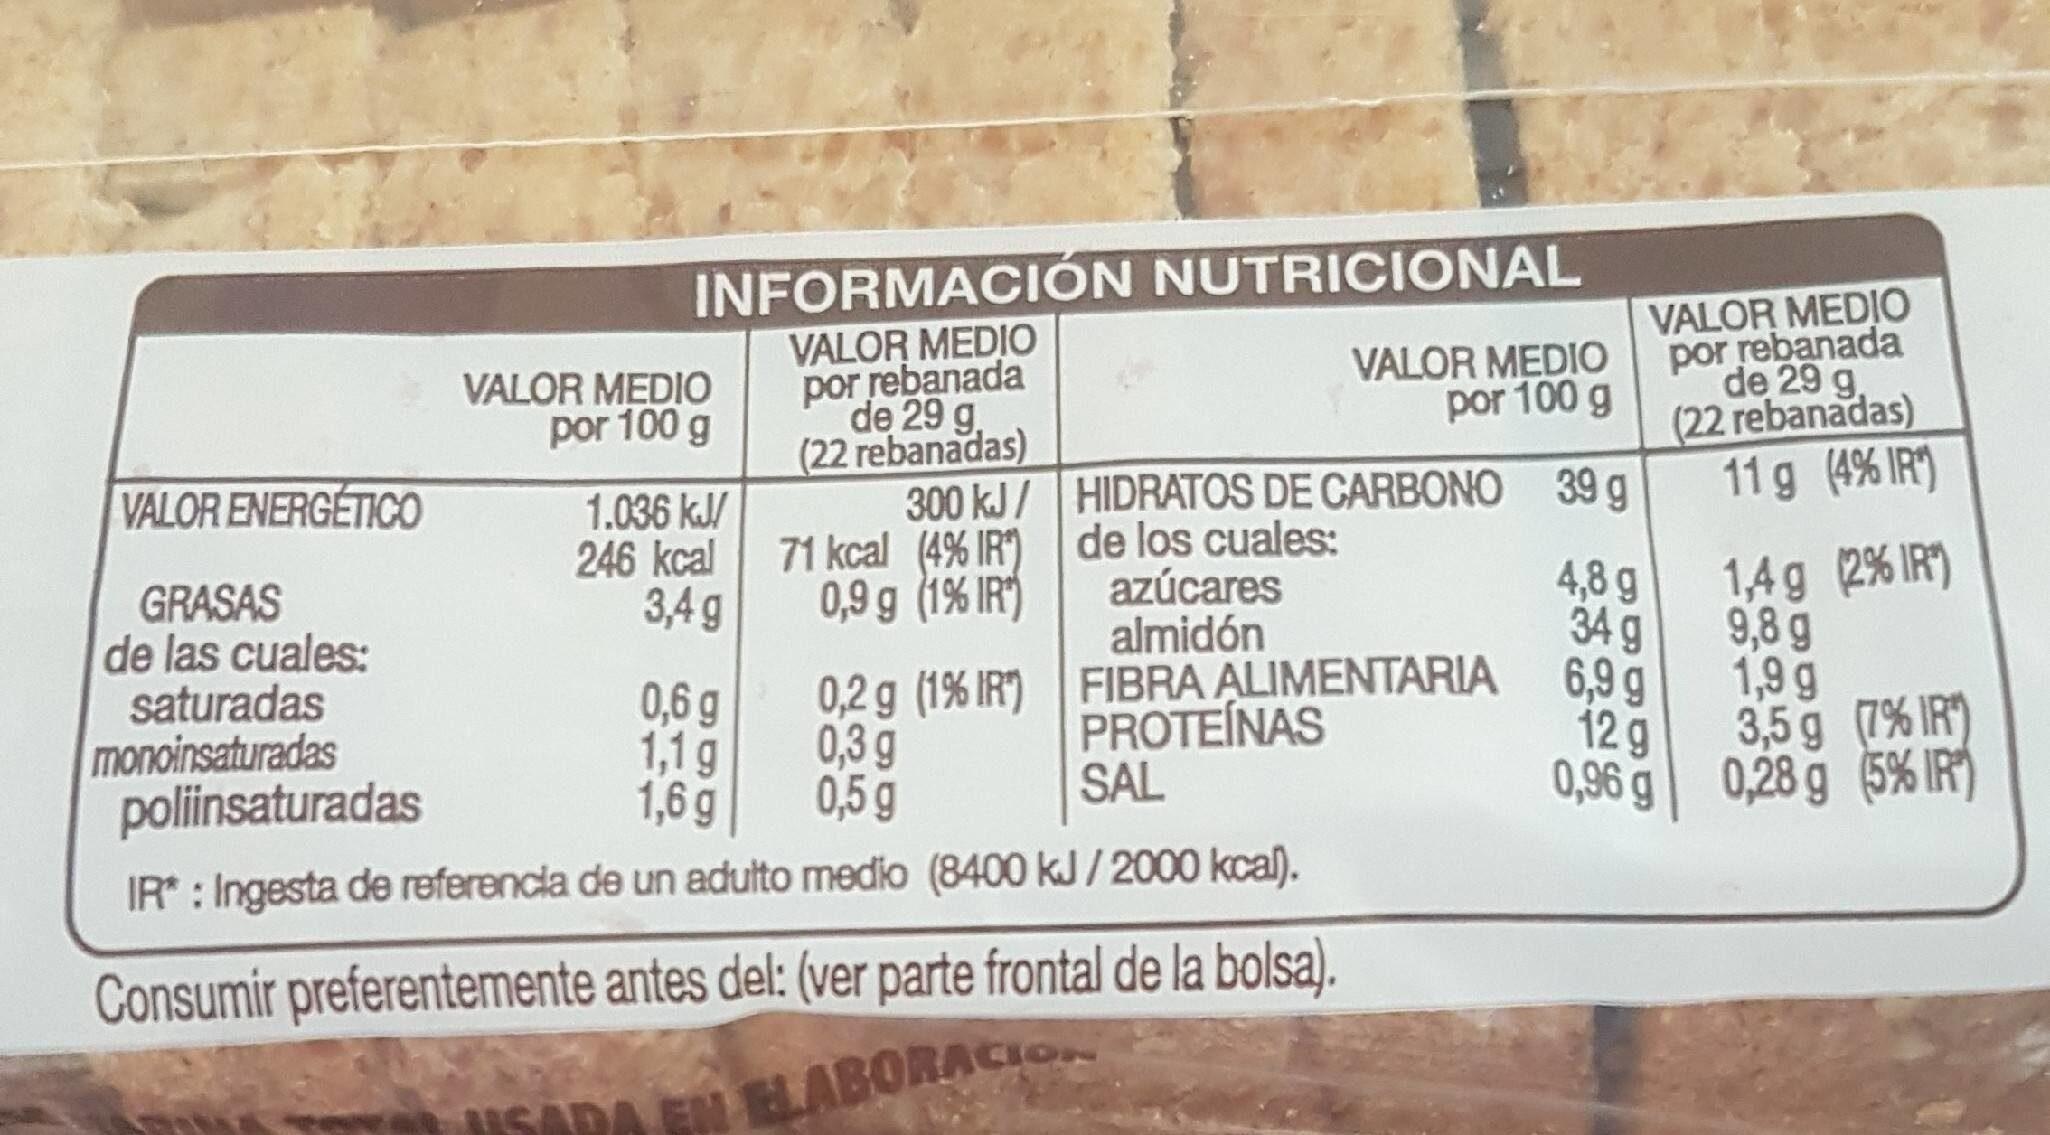 Silueta pan de molde integral cereales completo - Informations nutritionnelles - es